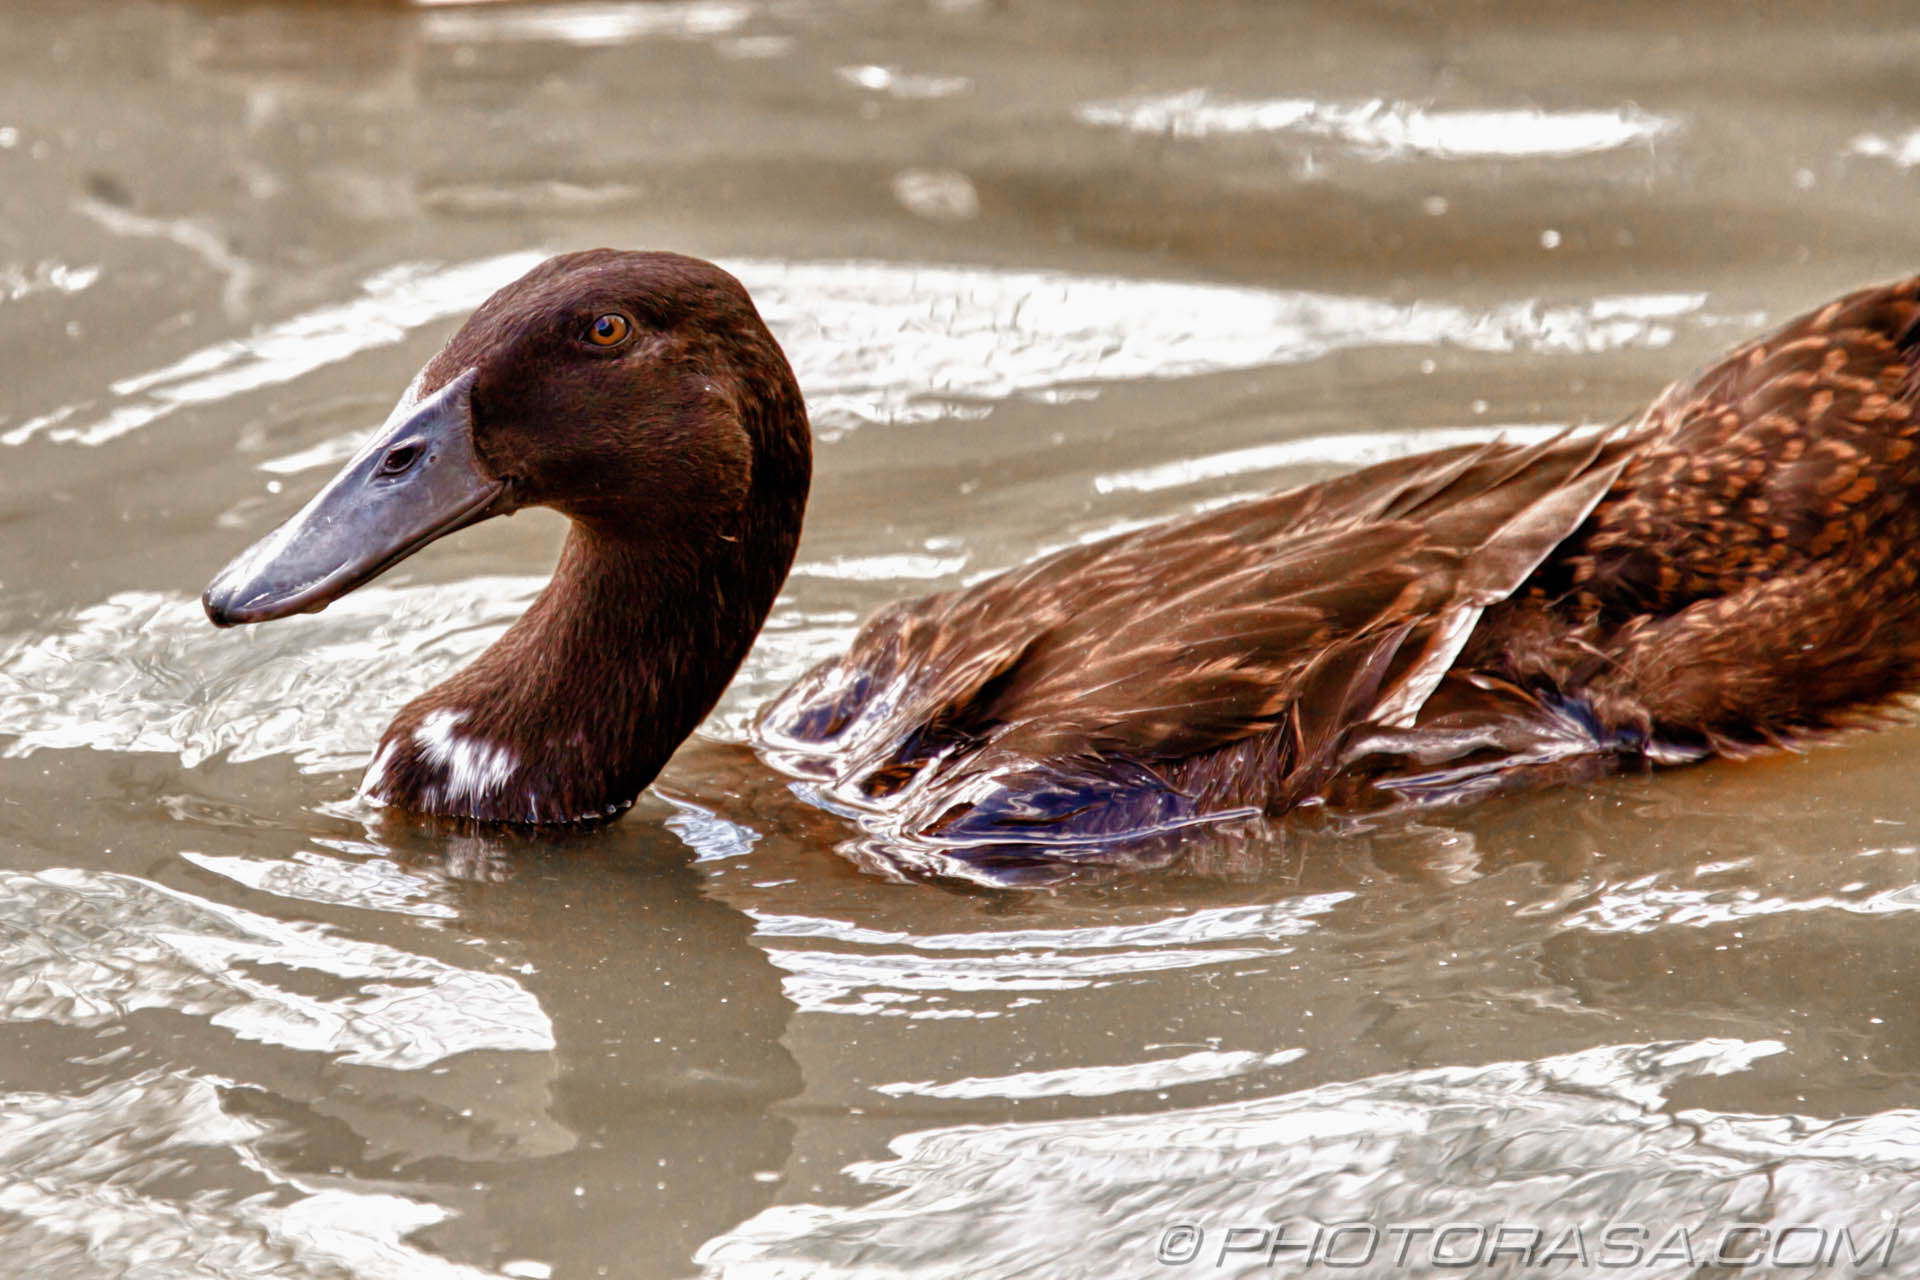 https://photorasa.com/birds-greenworld/dark-brown-campbell-duck/